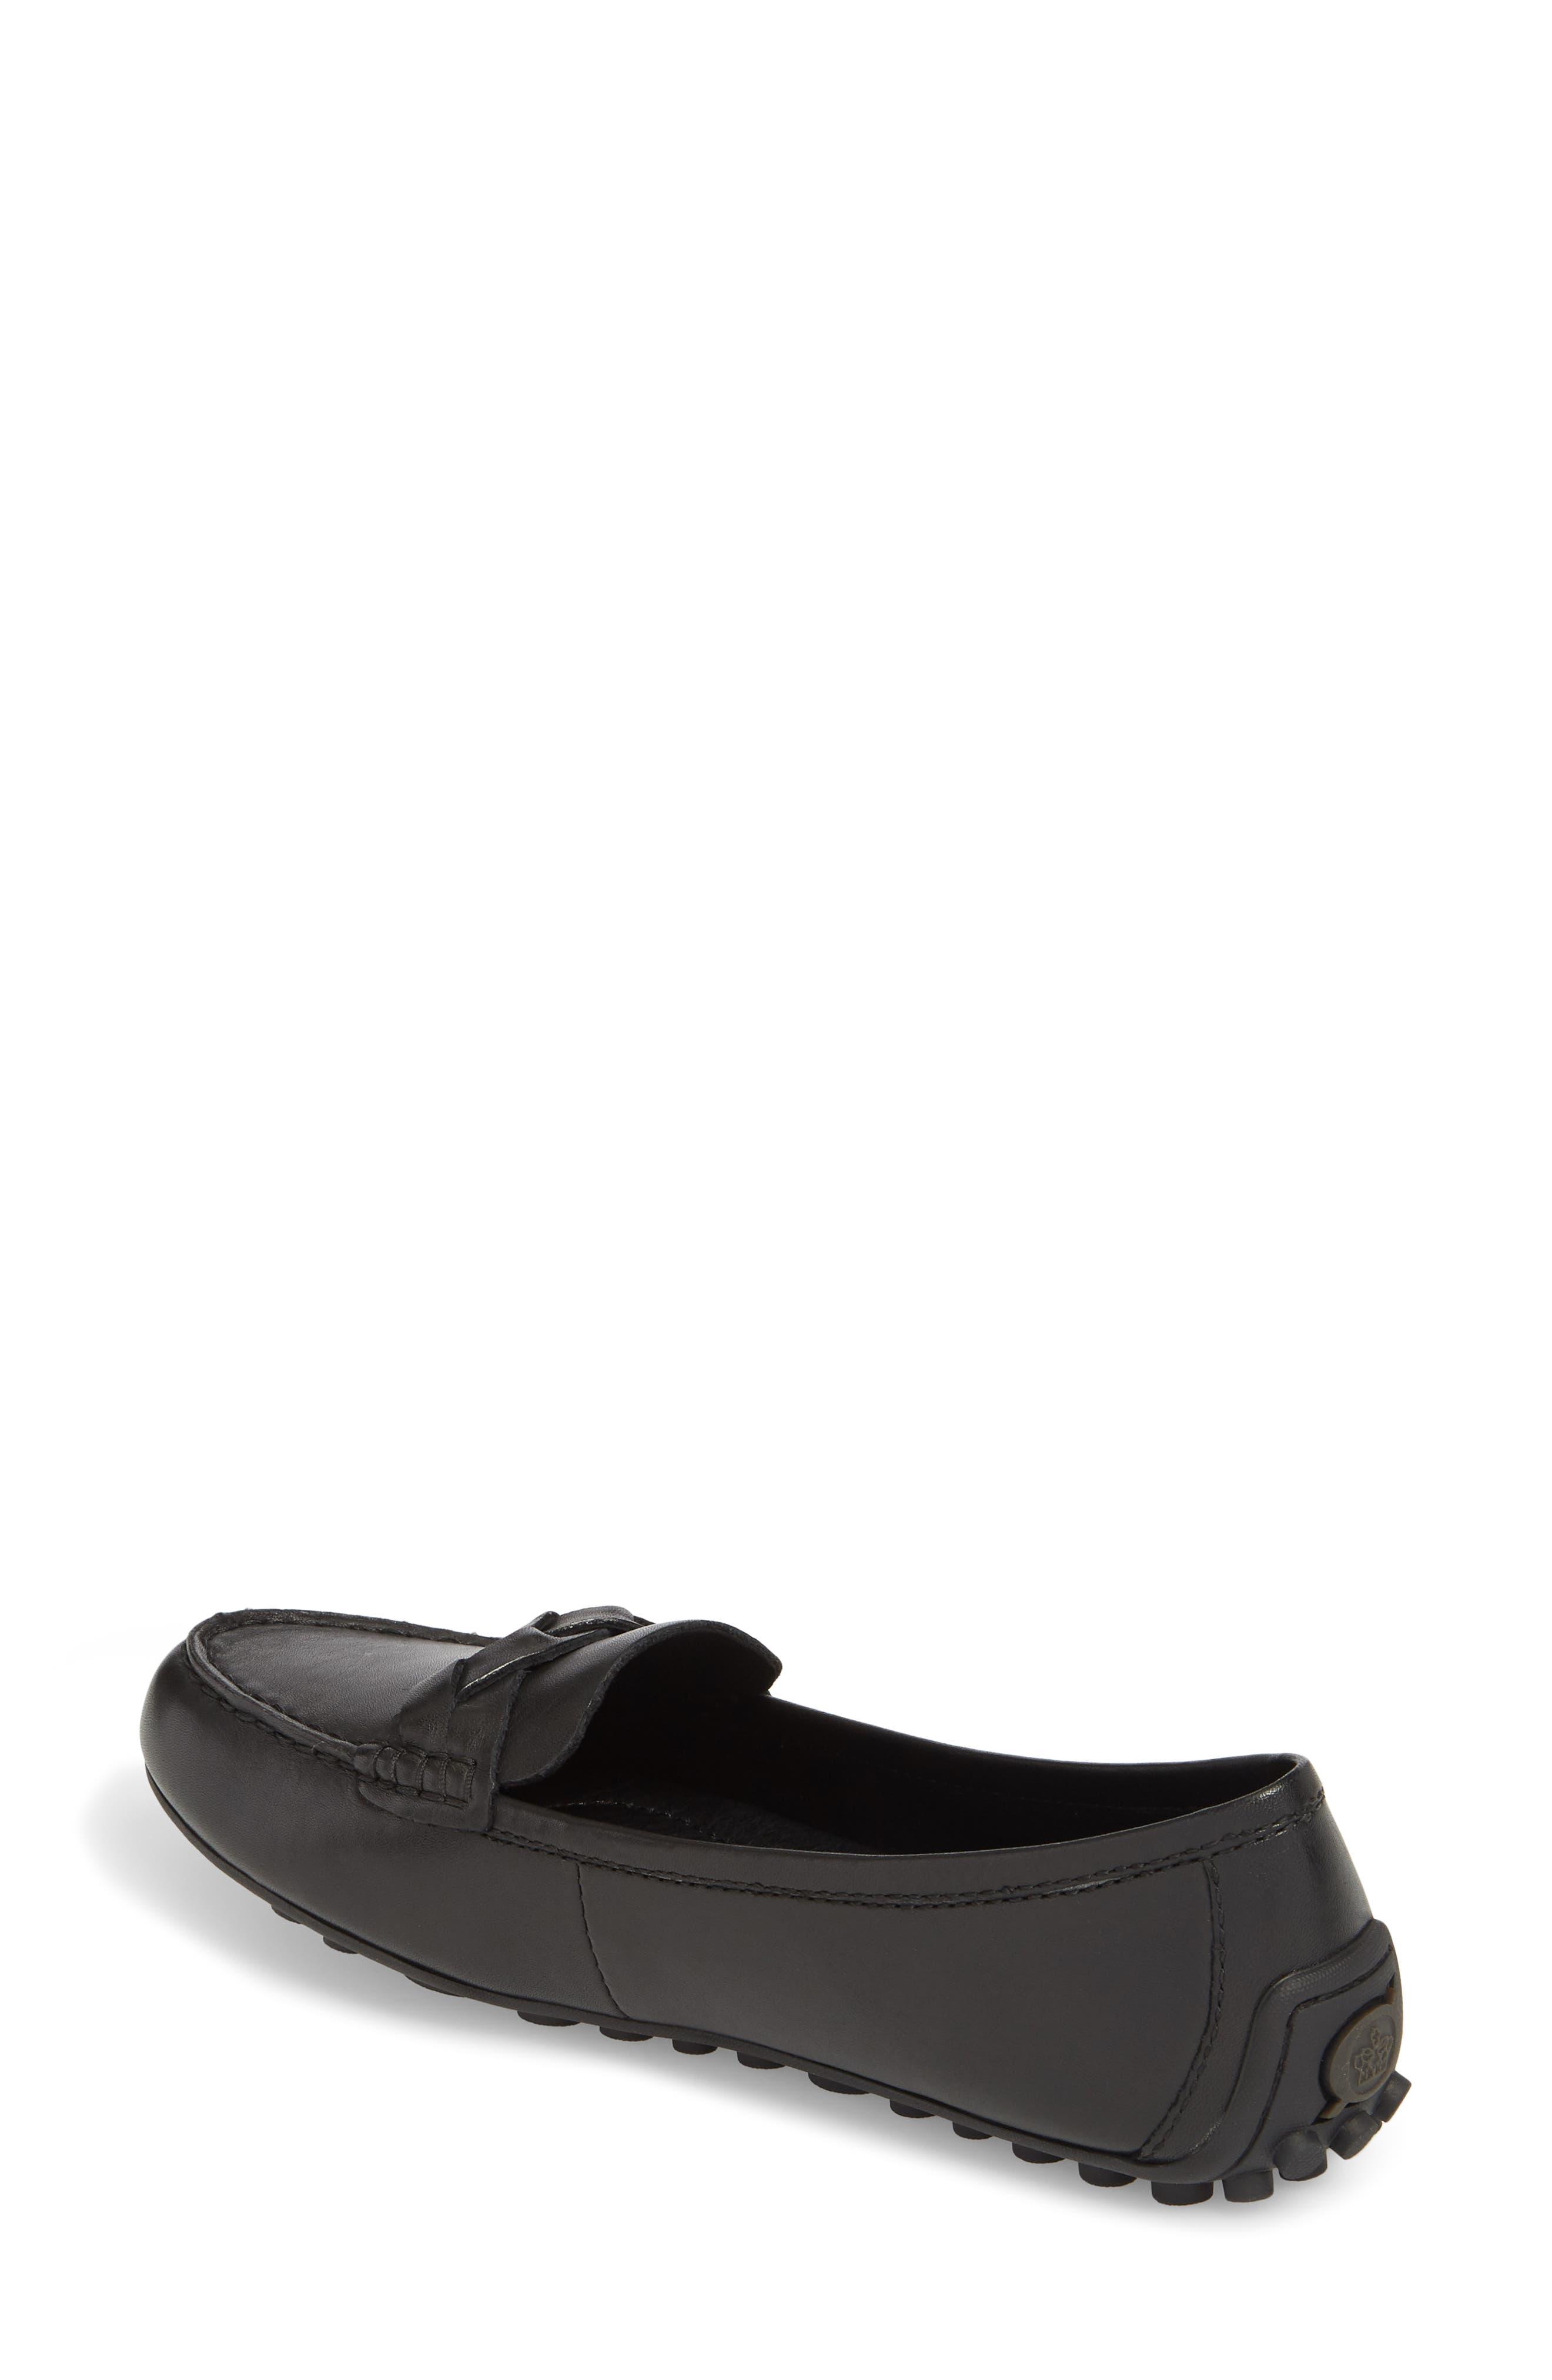 Kasa Loafer,                             Alternate thumbnail 2, color,                             Black Leather